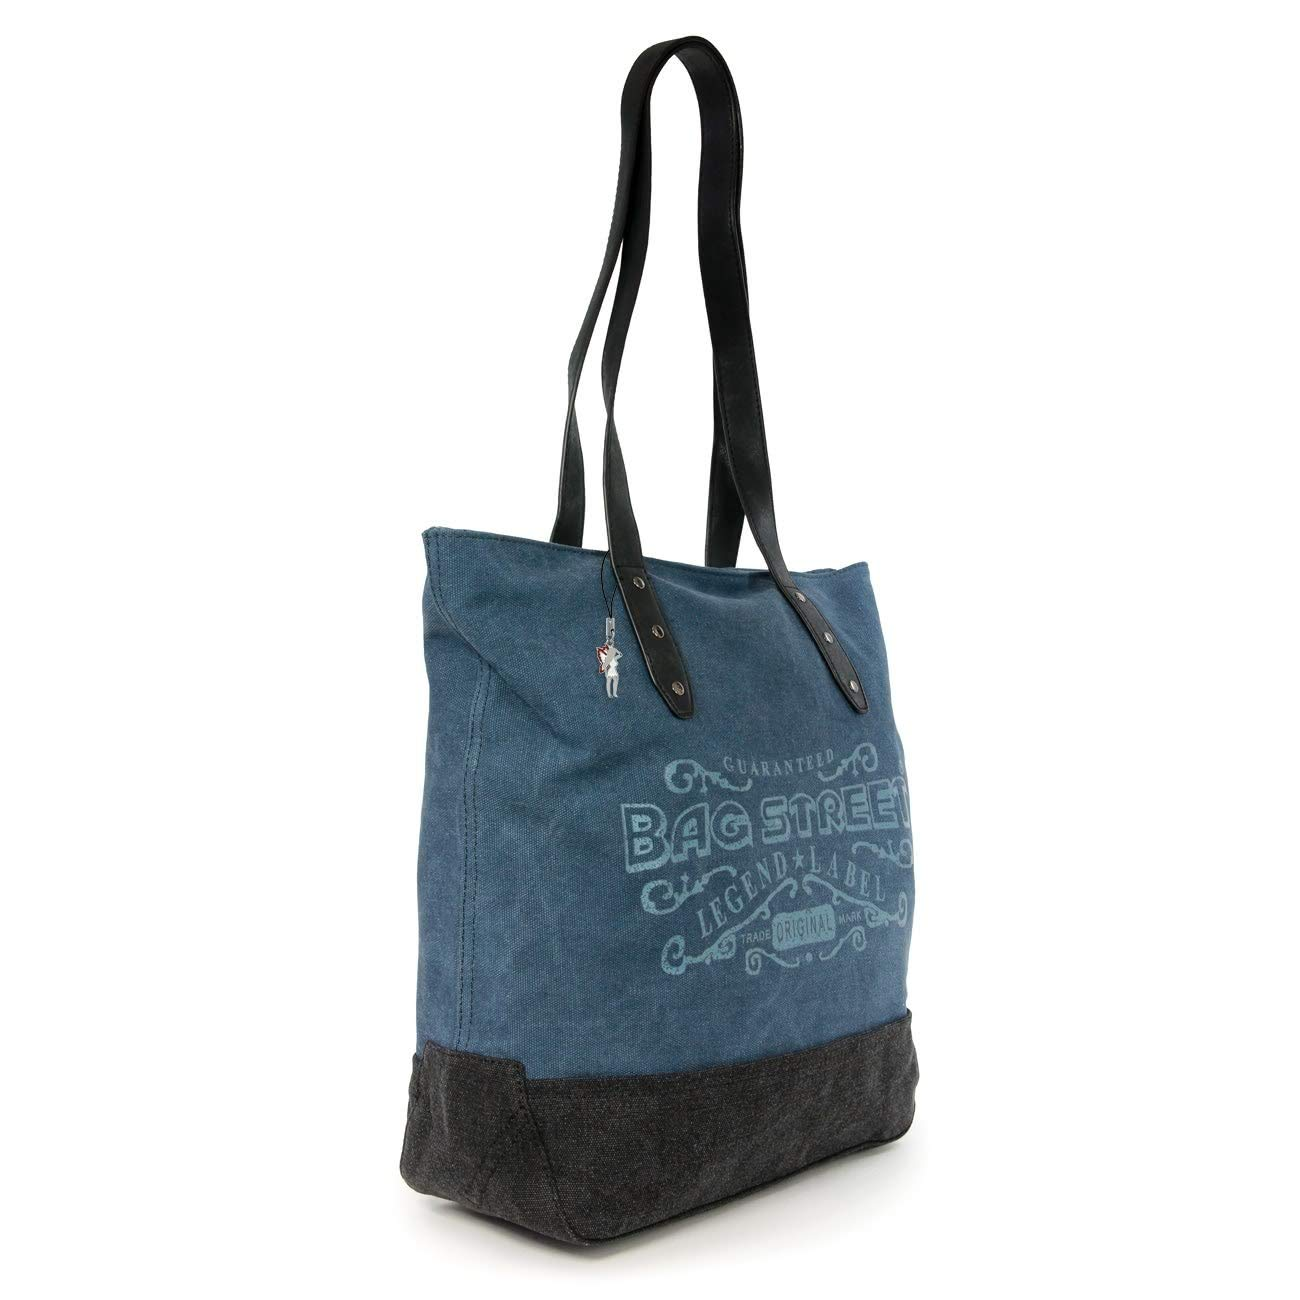 1a35c6ce9c246 imppac Beuteltasche navyblau Canvas Schultertasche Handtasche Bag Street  OTJ219B  Amazon.de  Schuhe   Handtaschen